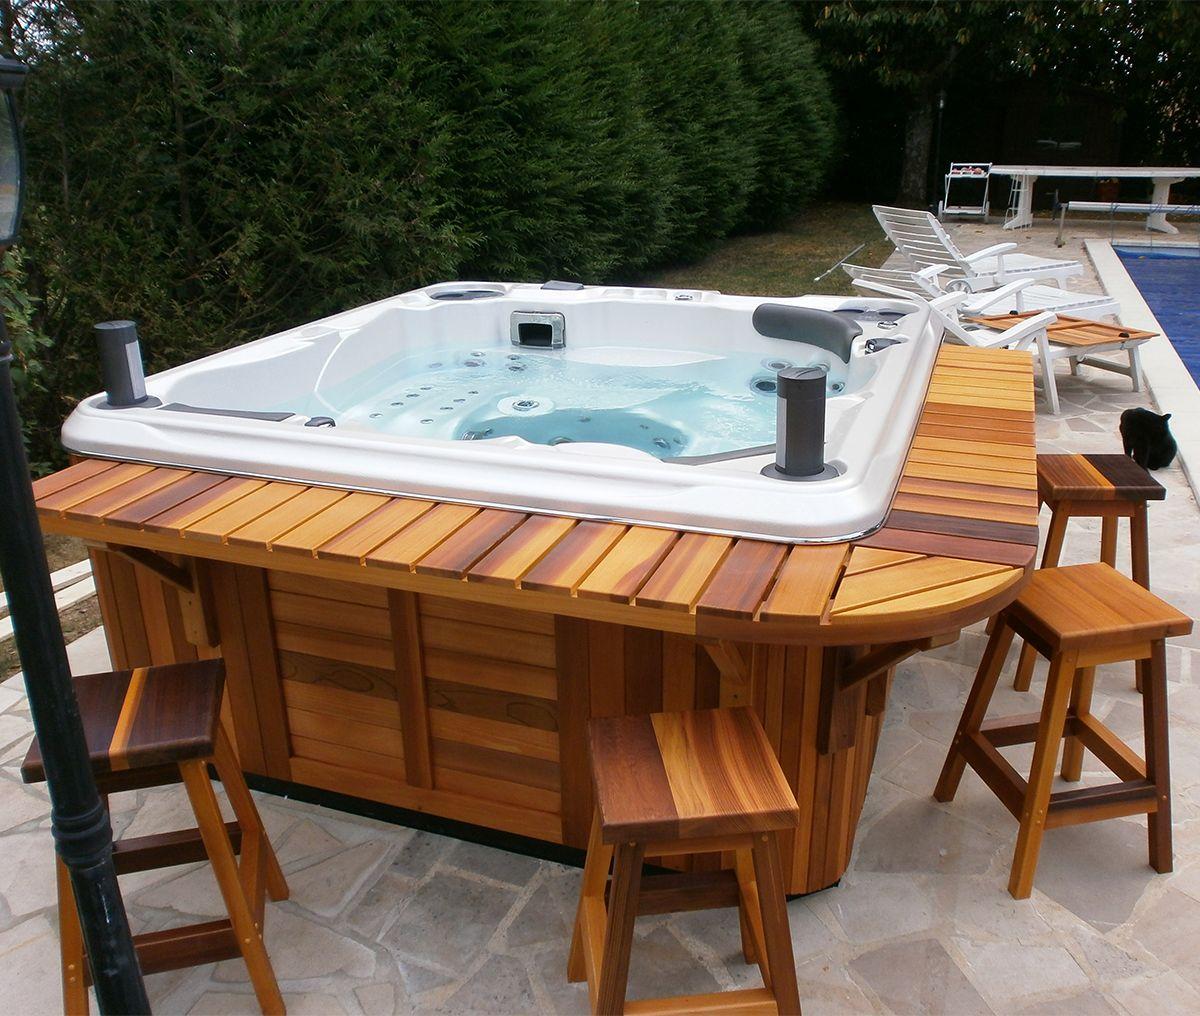 Hot Tubs Cleaning Hot Tub Hot Tub Bar Hot Tub Deck